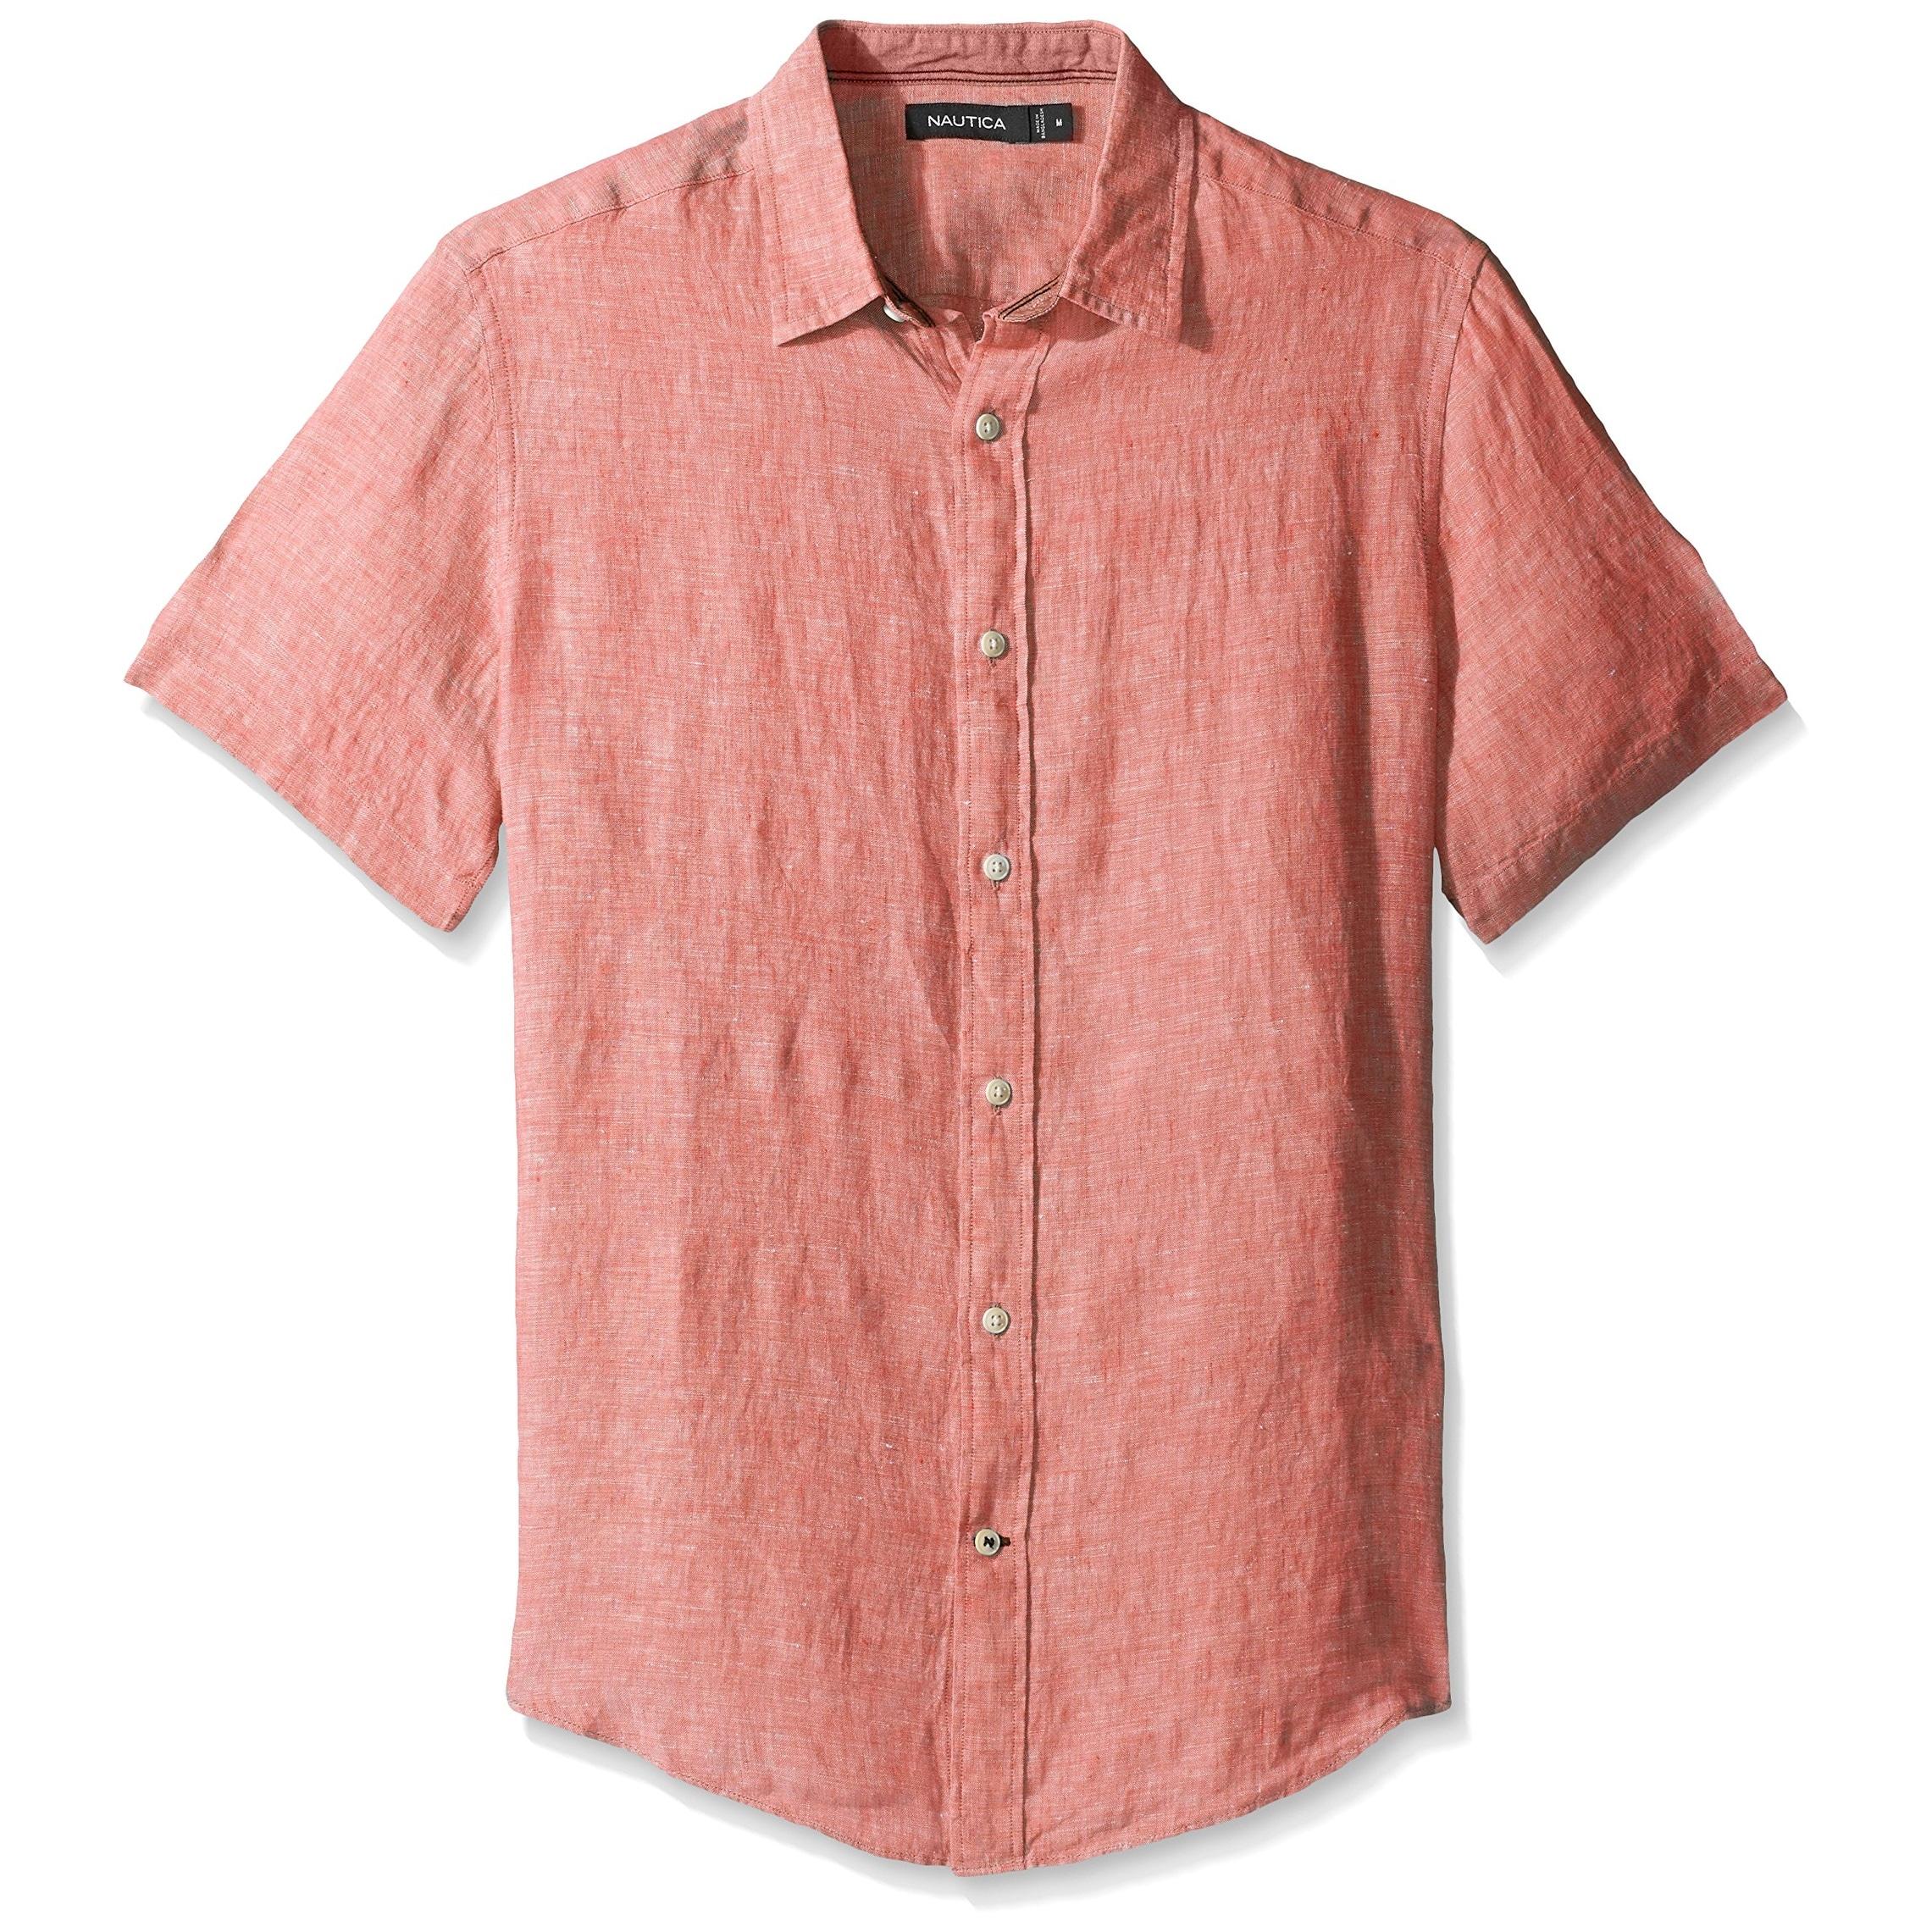 Shop Nautica New Pale Coral Pink Mens Size Medium M Button Down